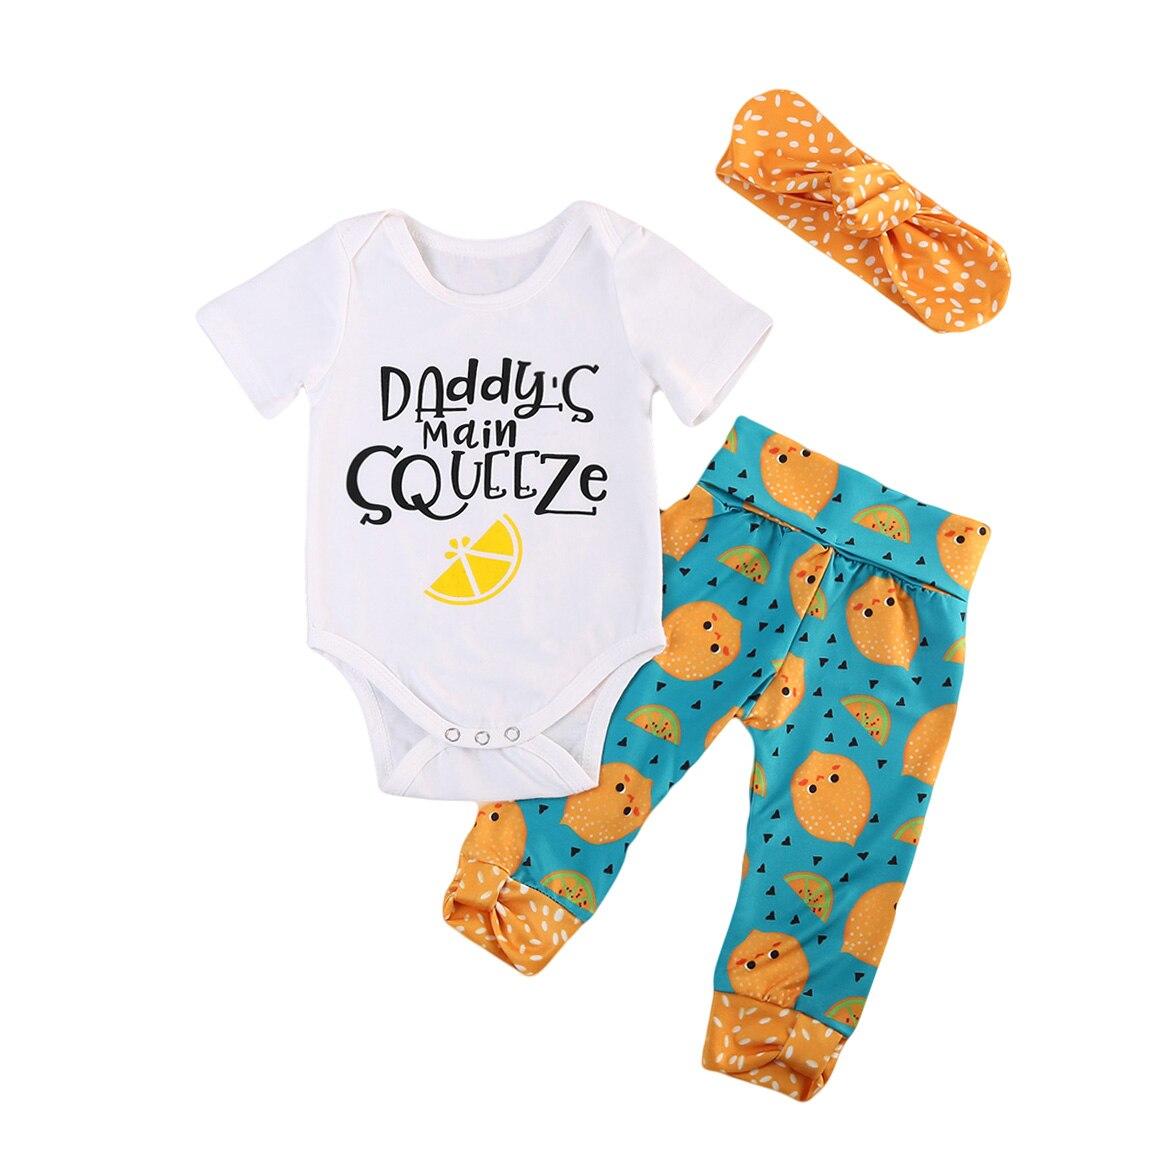 Bebé recién nacido Niñas ropa Sets manga corta romper Pantalones Bandas para la cabeza 3 unids trajes ropa del bebé